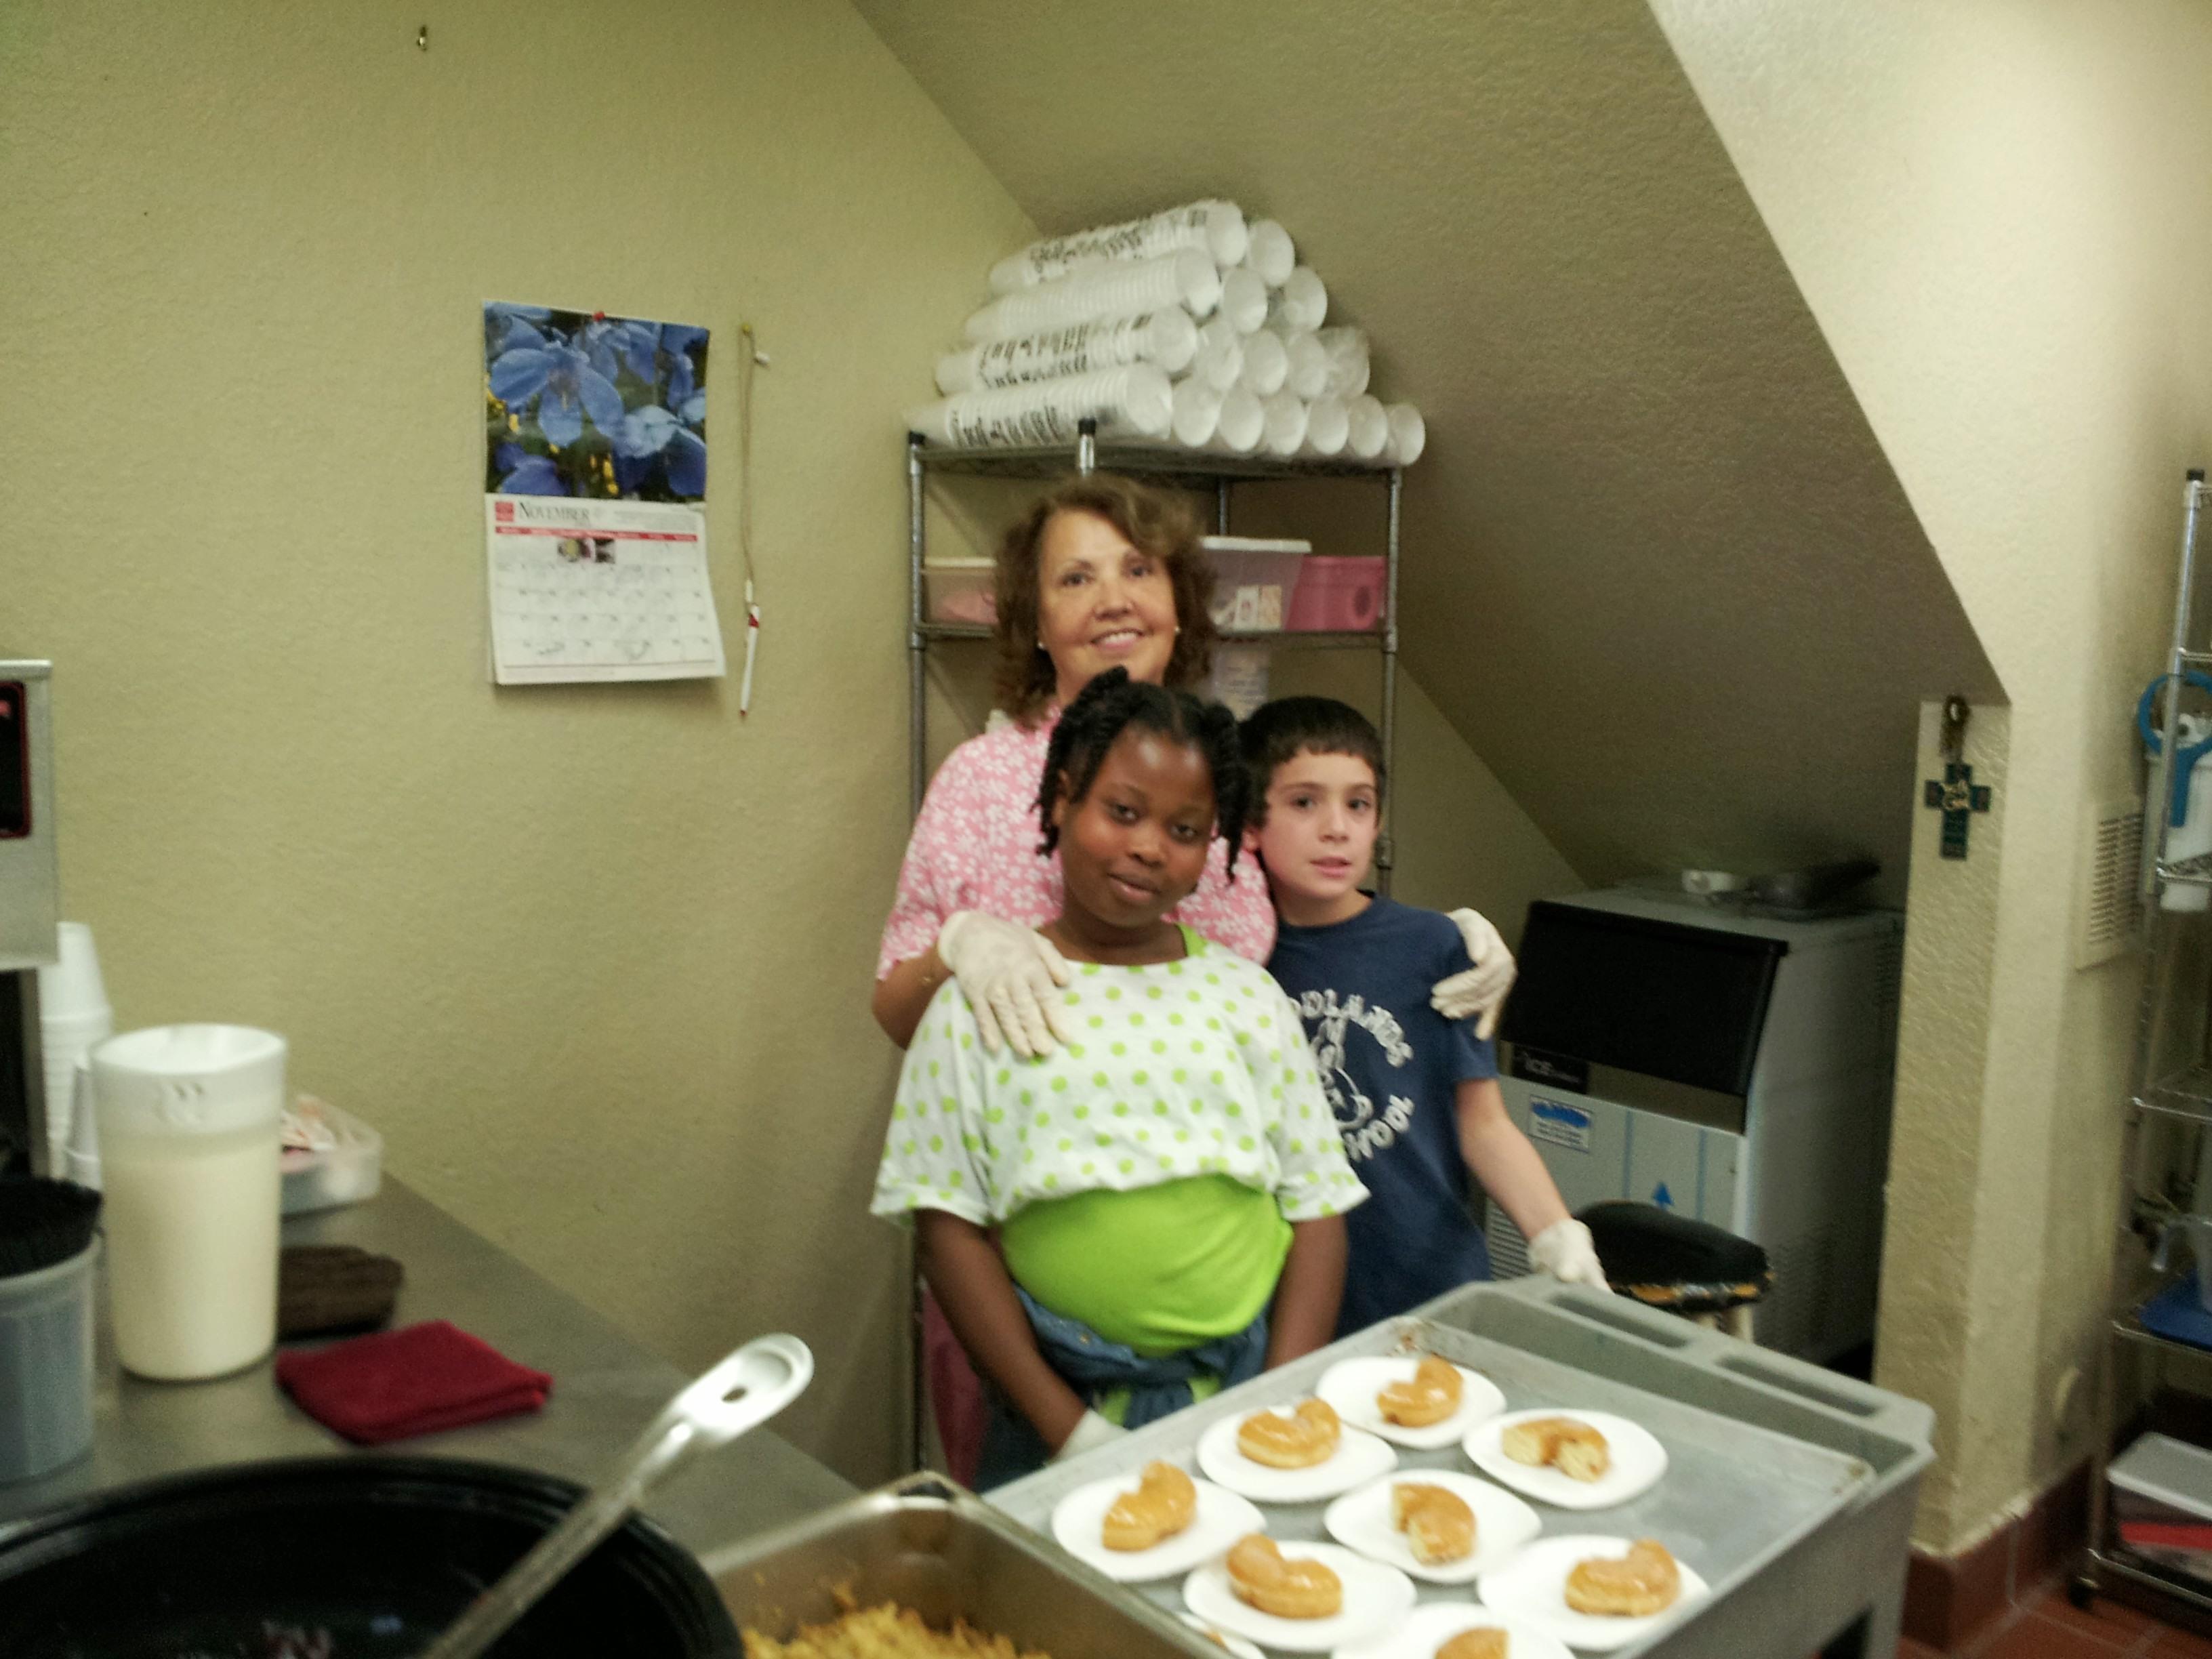 Soup kitchen volunteers preparing food for homeless people.